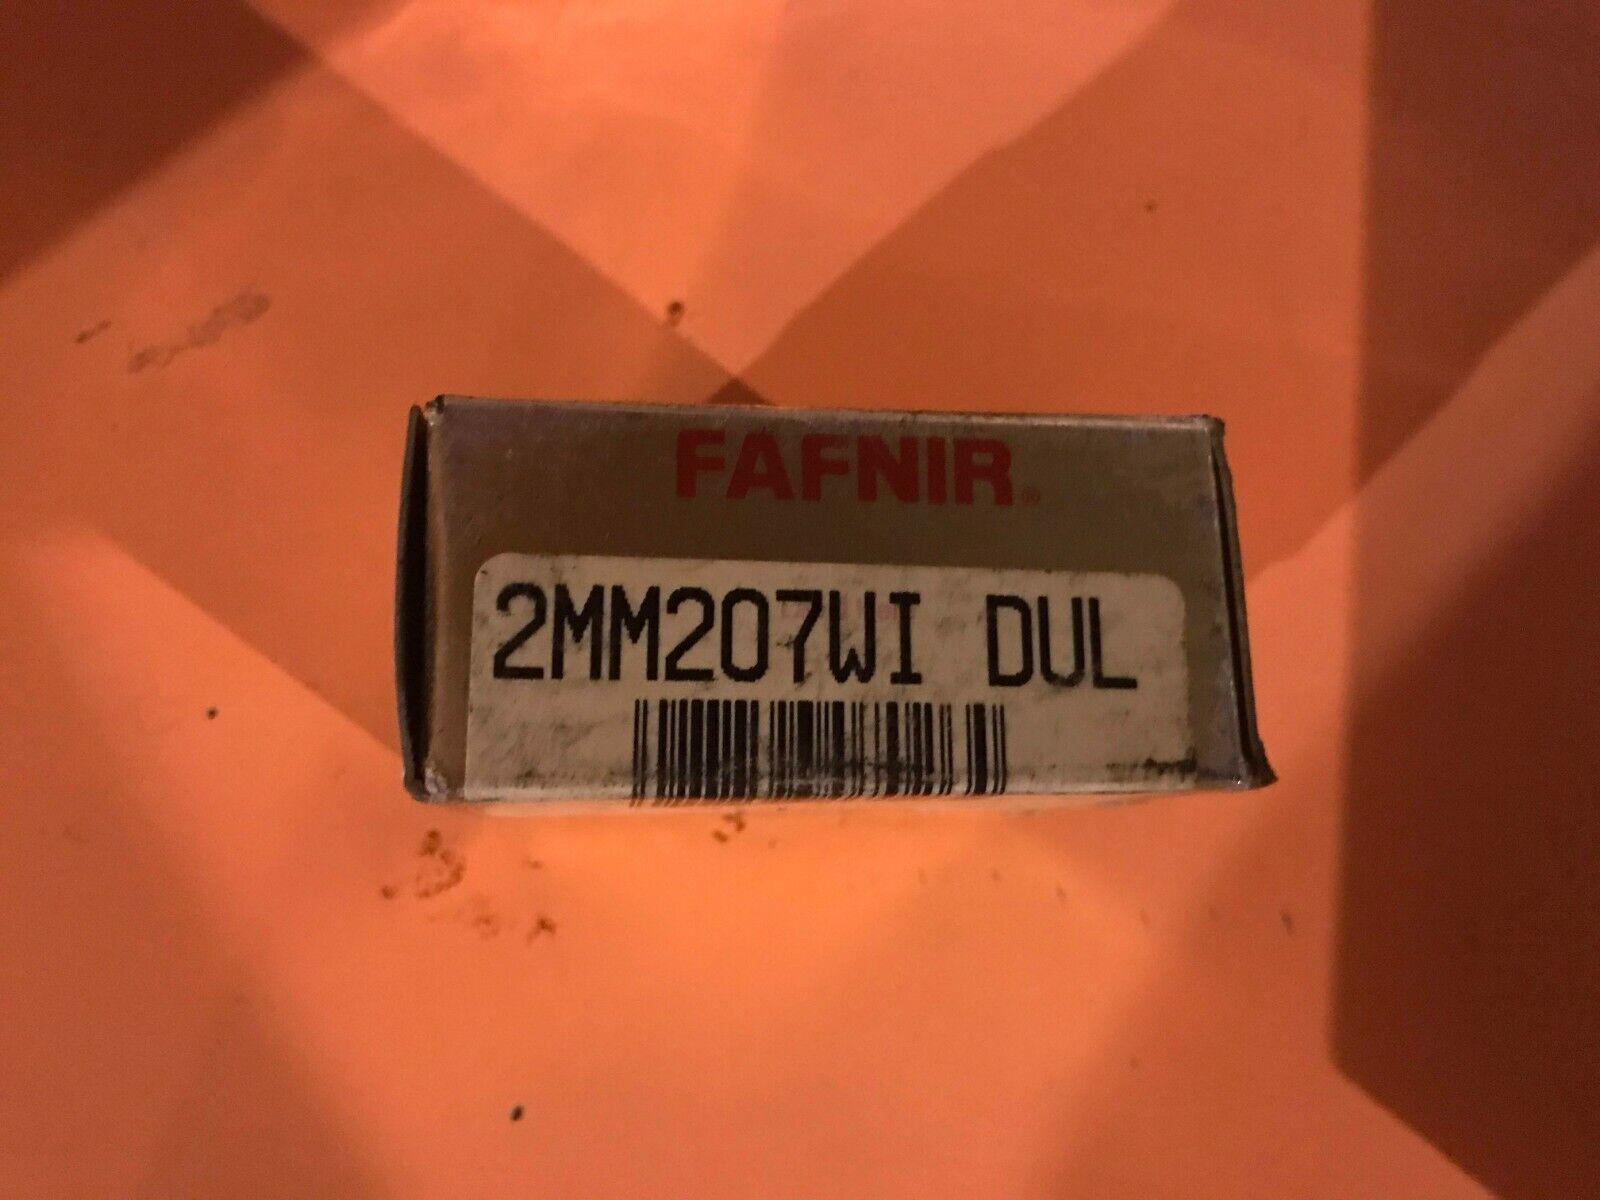 NEW FAFNIR 2MM207WI DUL SUPER PRECISION BEARING SET 2MM207WIDUL